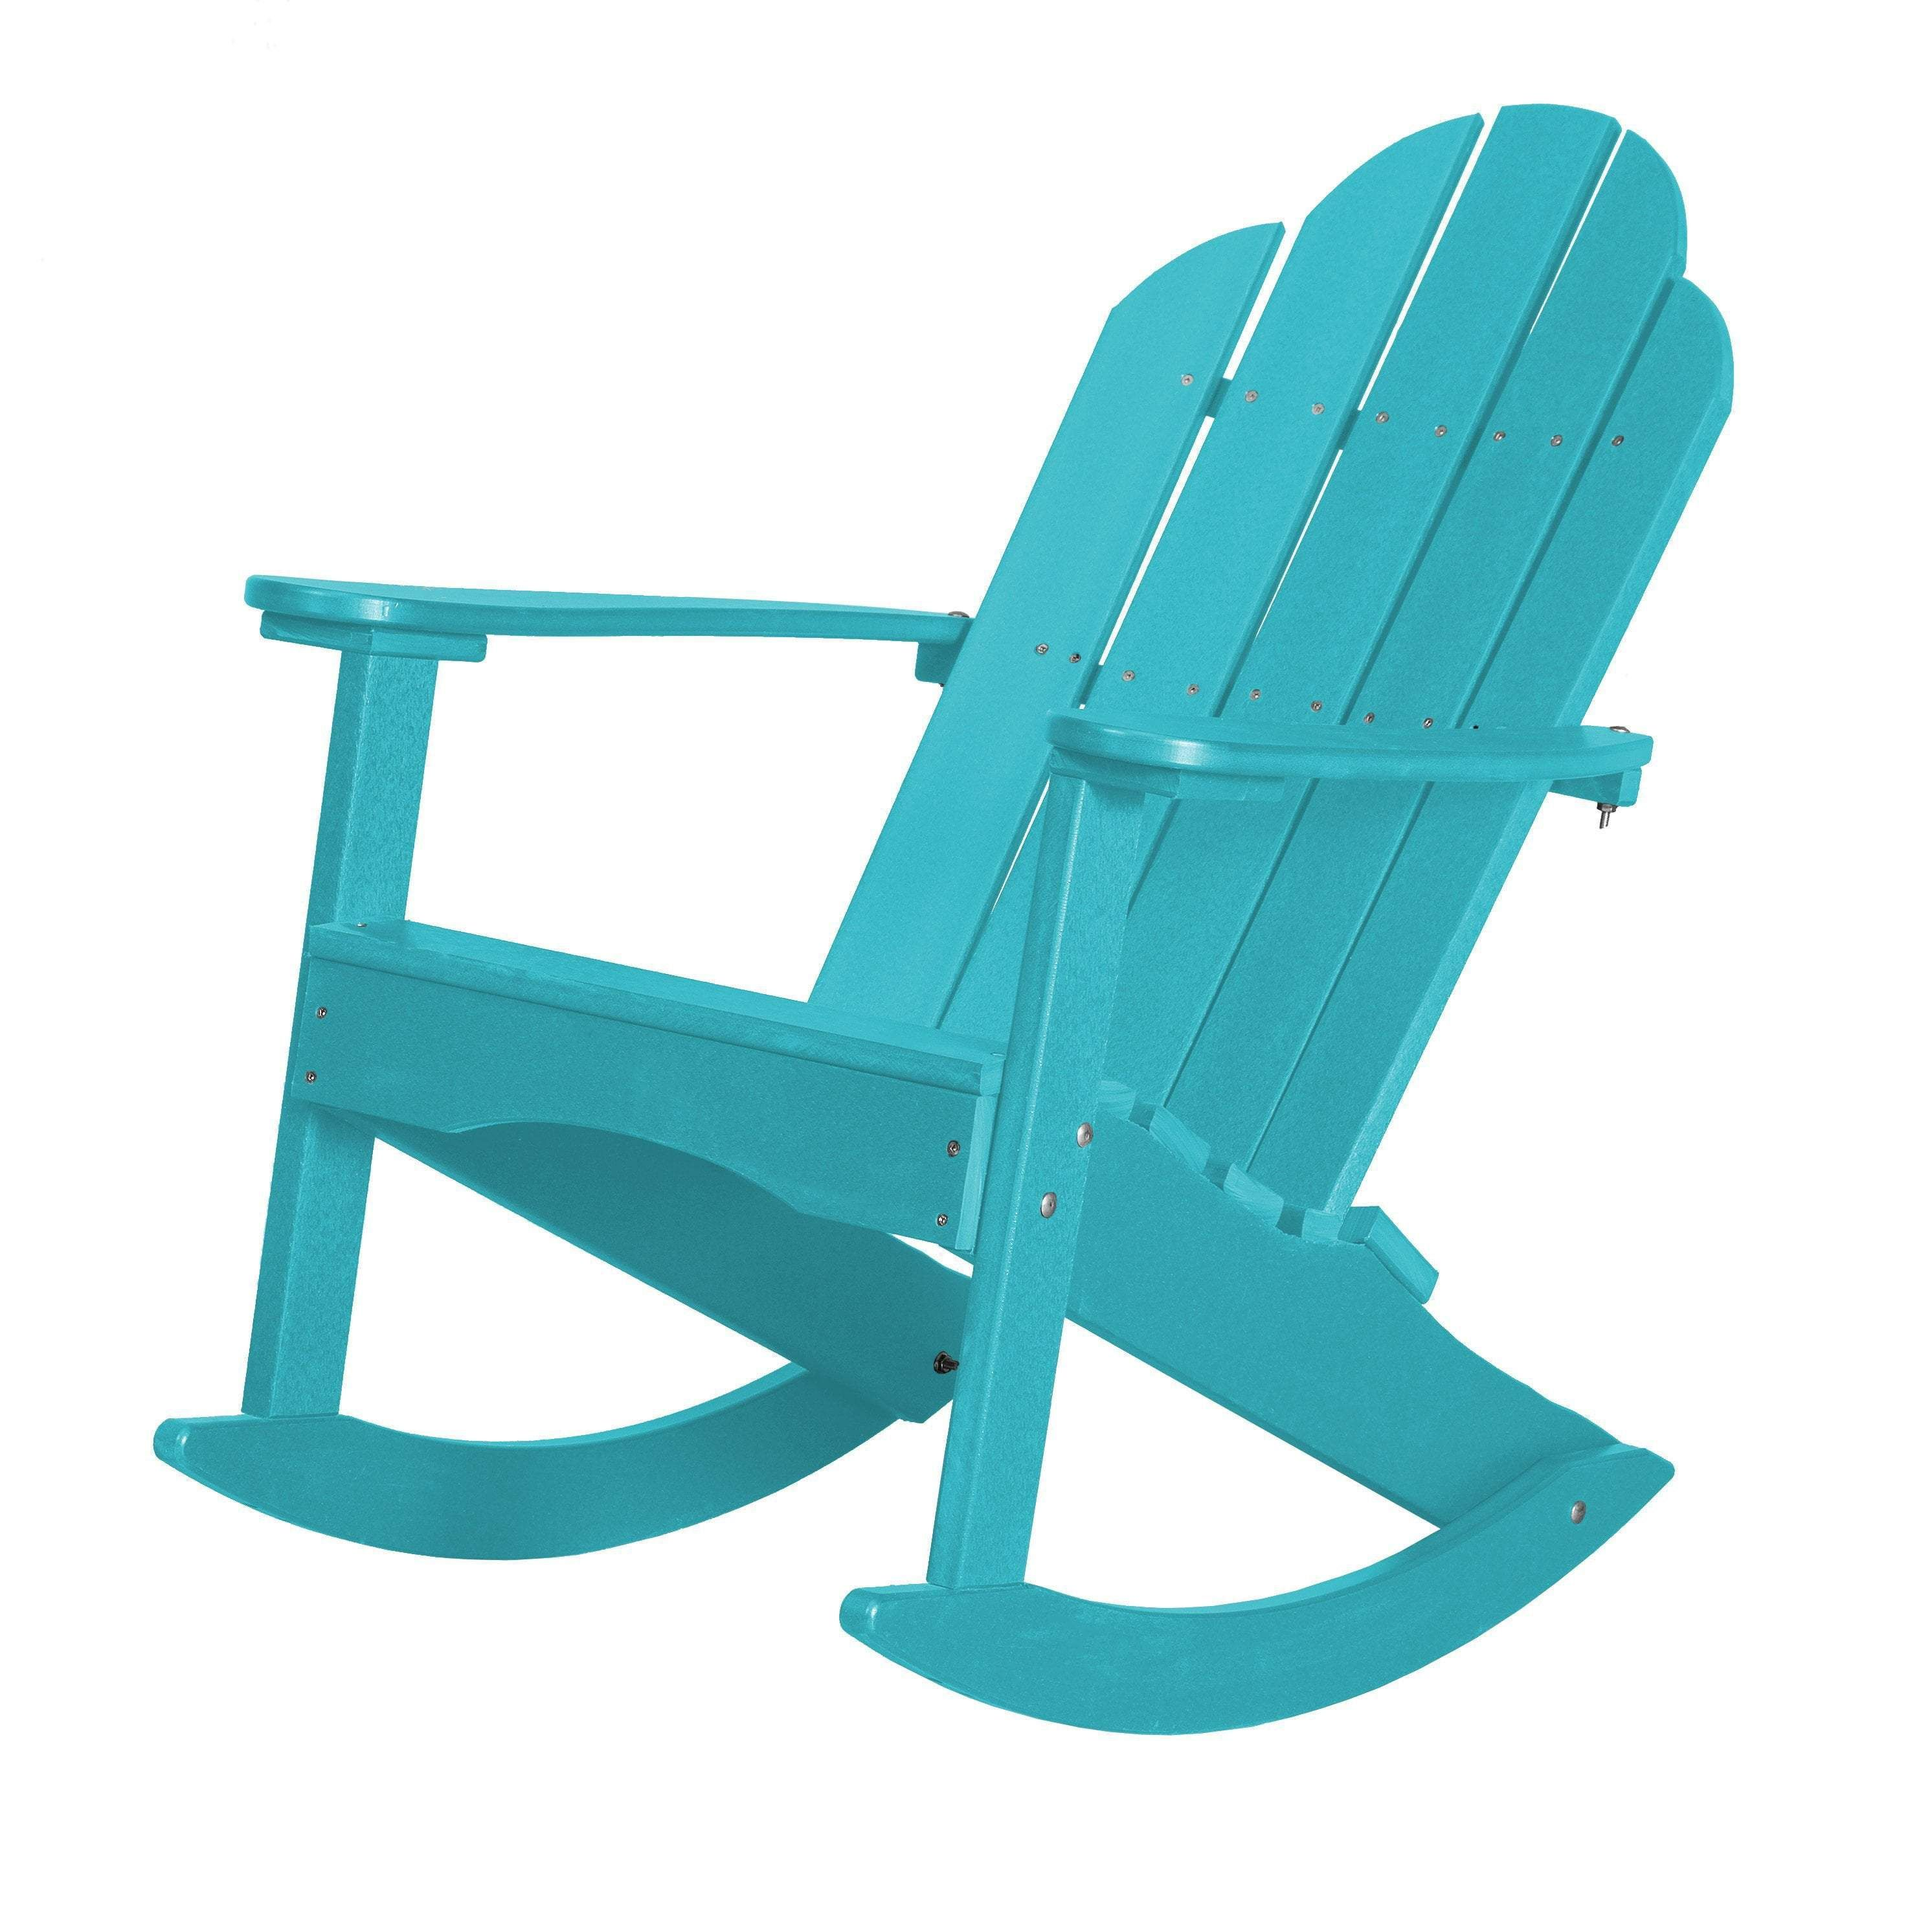 Fine Wildridge Classic Recycled Plastic Adirondack Rocker In 2019 Pdpeps Interior Chair Design Pdpepsorg